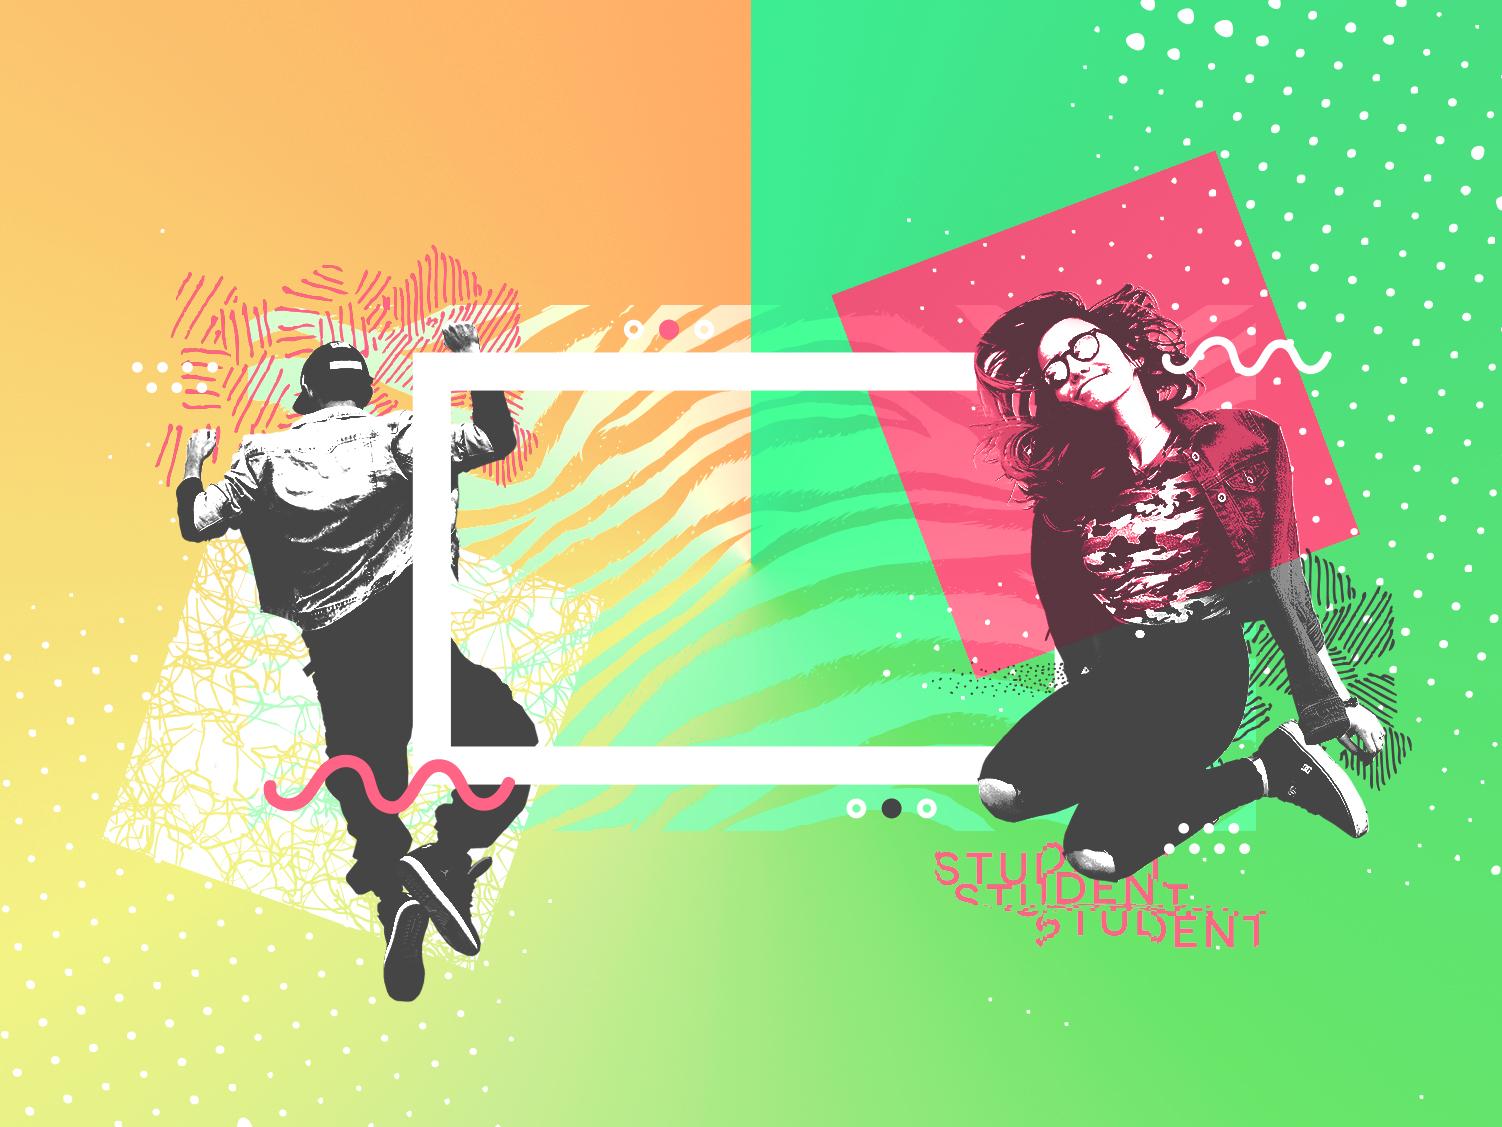 StudentMinistry-Theme-Blank.jpg